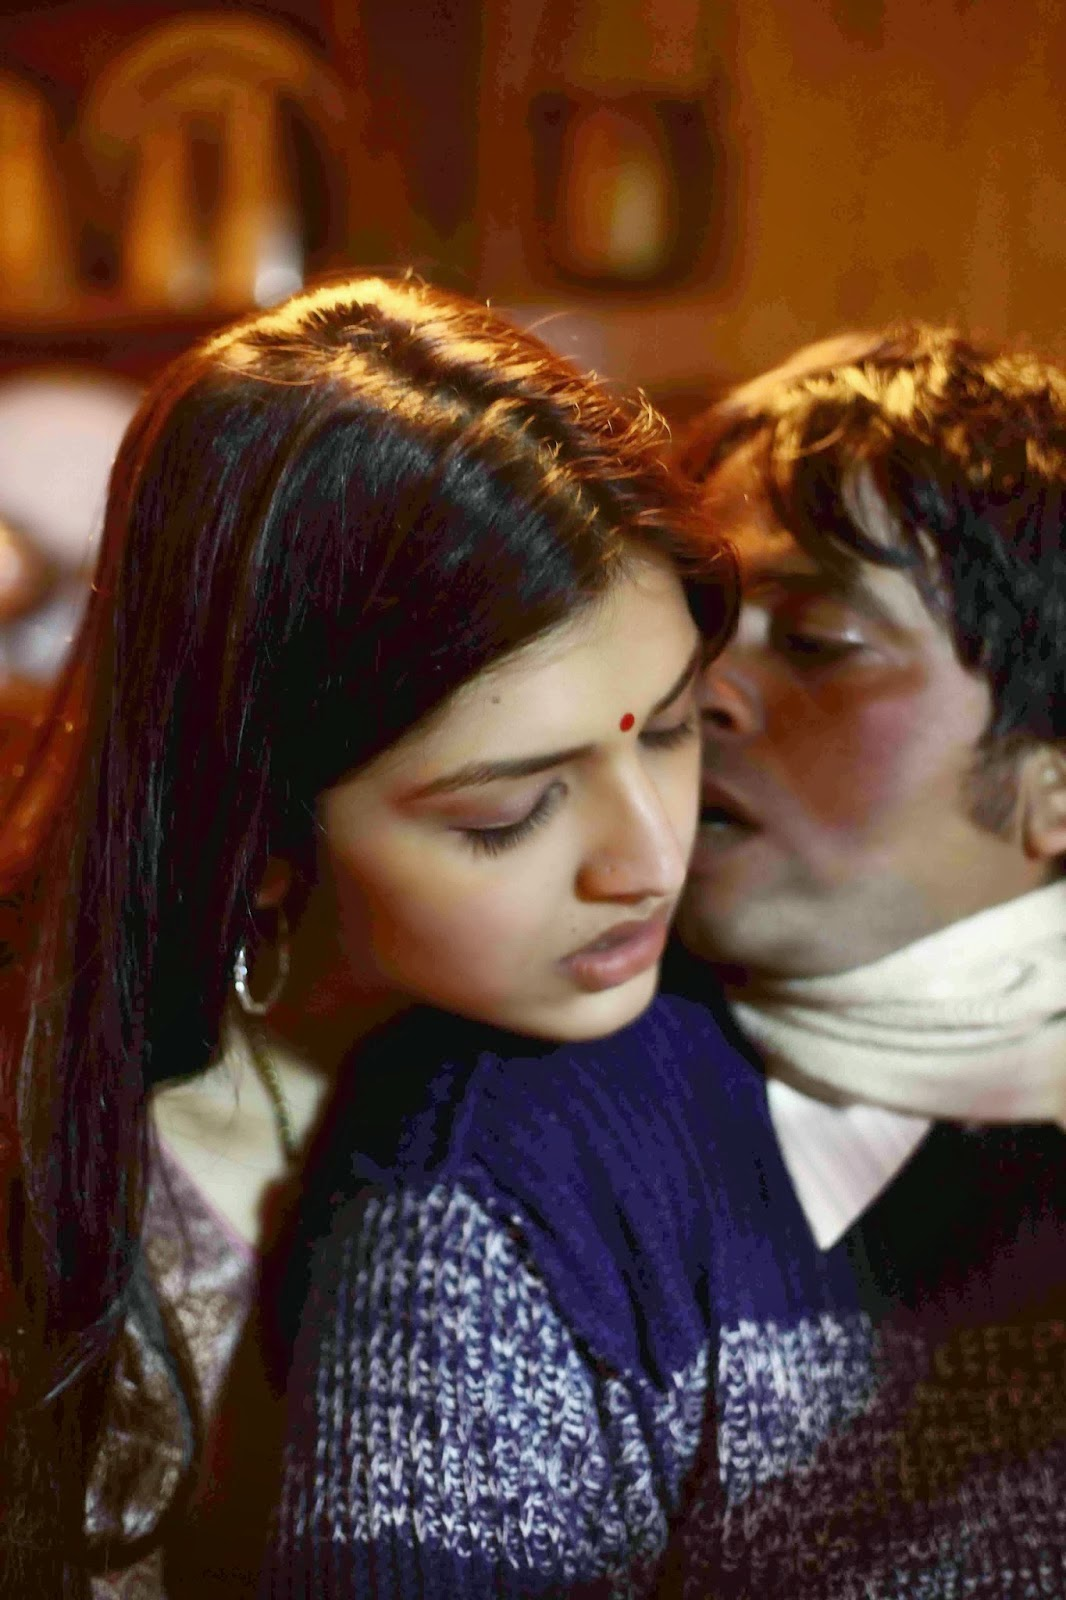 Mastram 2014 Full Hindi Movie Free Downlaod